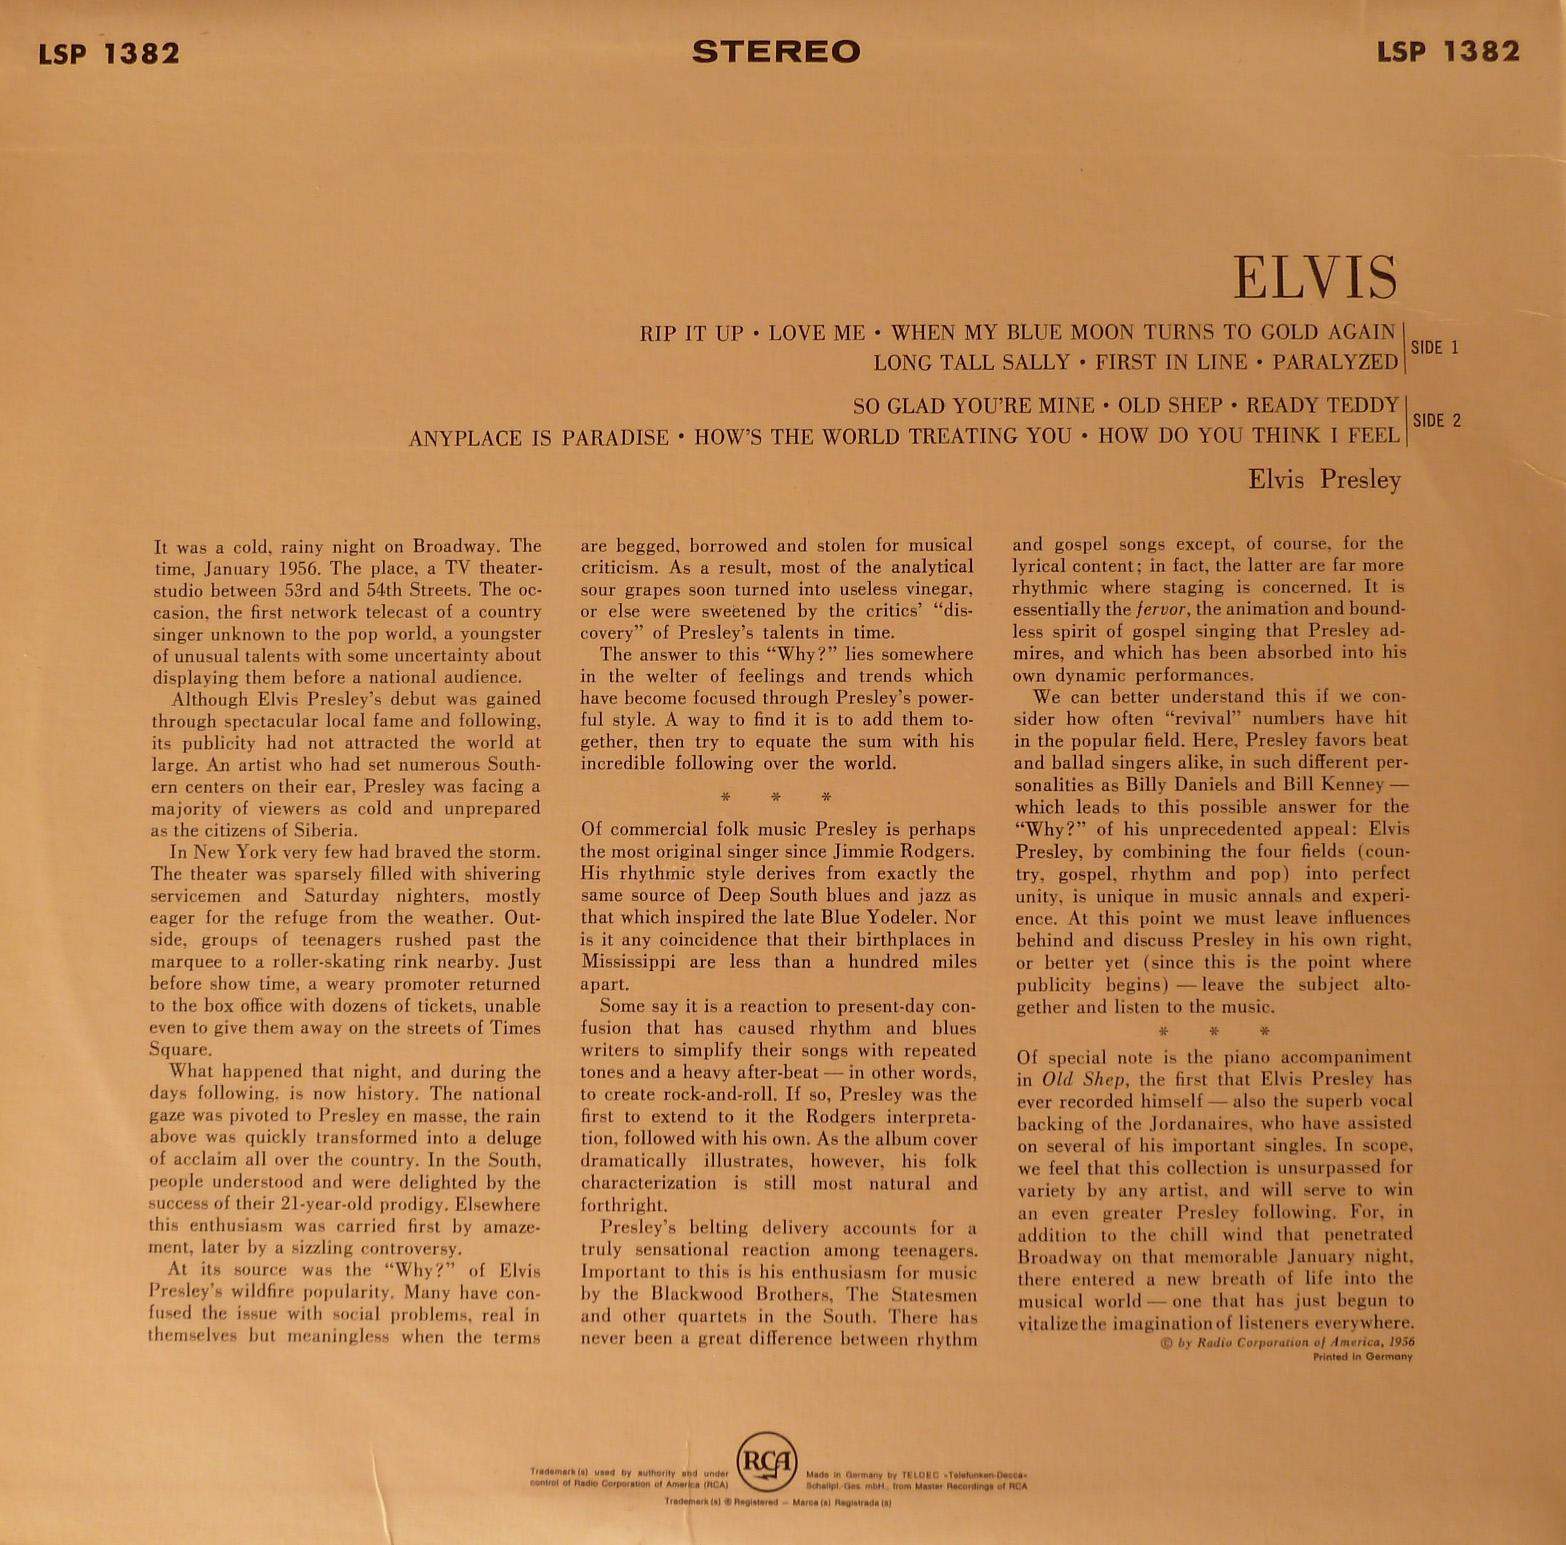 ELVIS Elvis_1956_1966_lsp_r2qubm